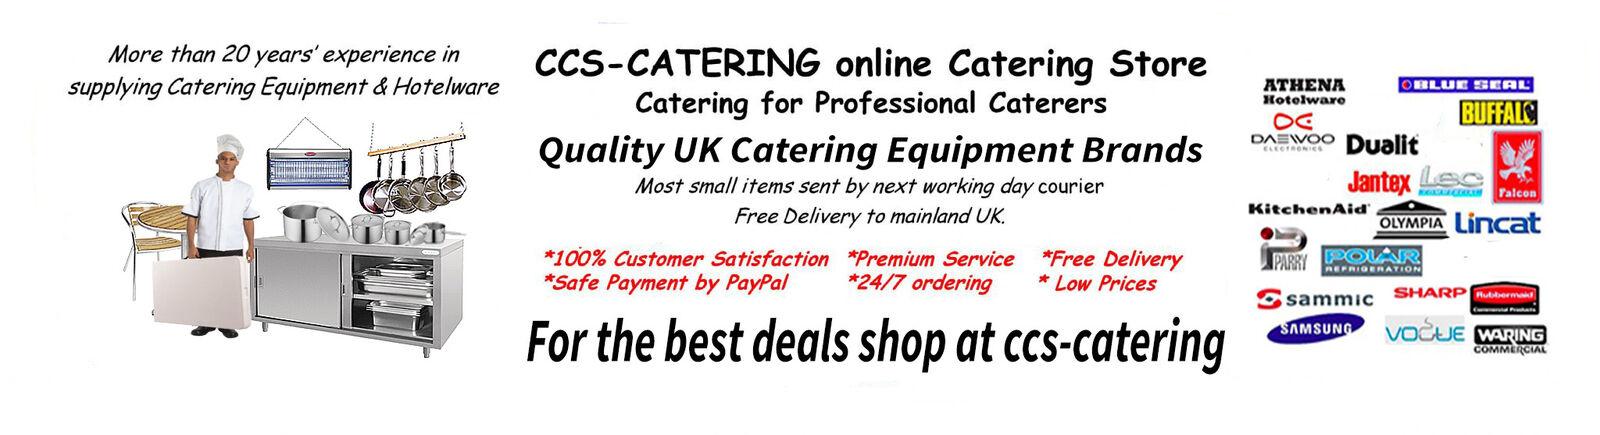 CCS-Catering